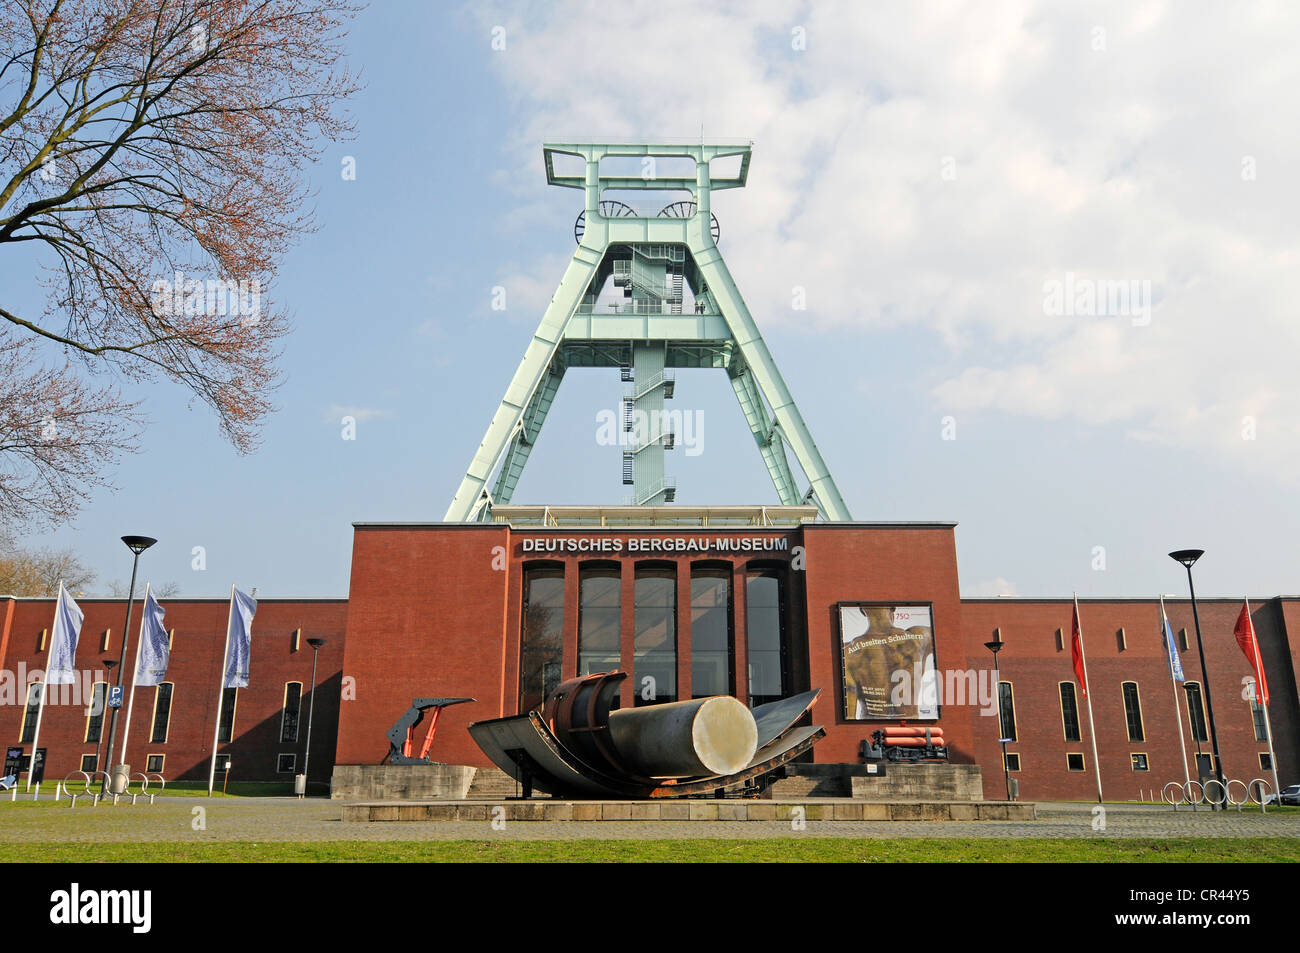 Headframe or winding tower, German Mining Museum, Bochum, Ruhr Area, North Rhine-Westphalia, Germany, Europe - Stock Image